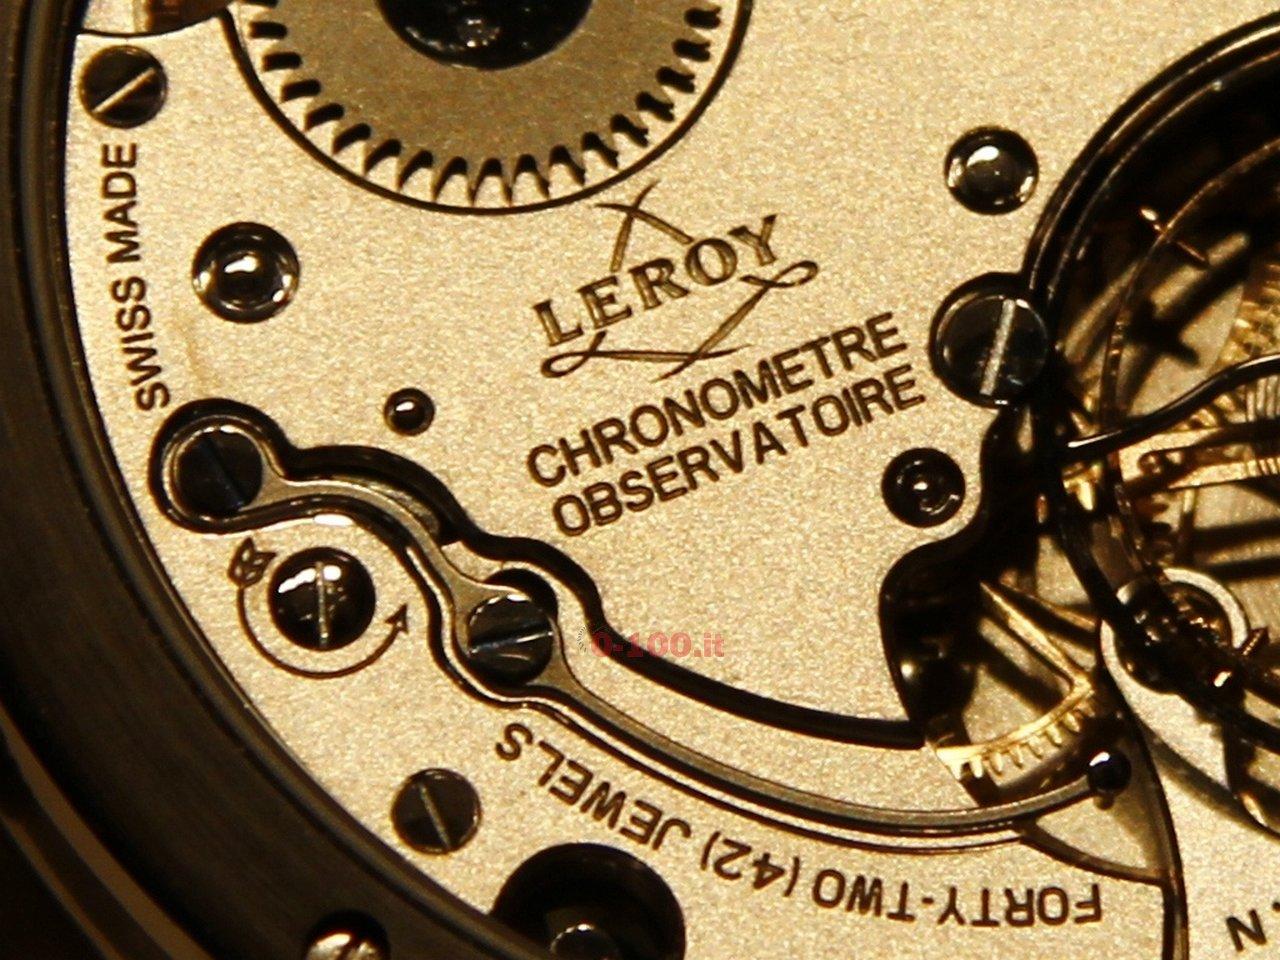 baselworld-2015_leroy-chronometer-l200-0-100-16